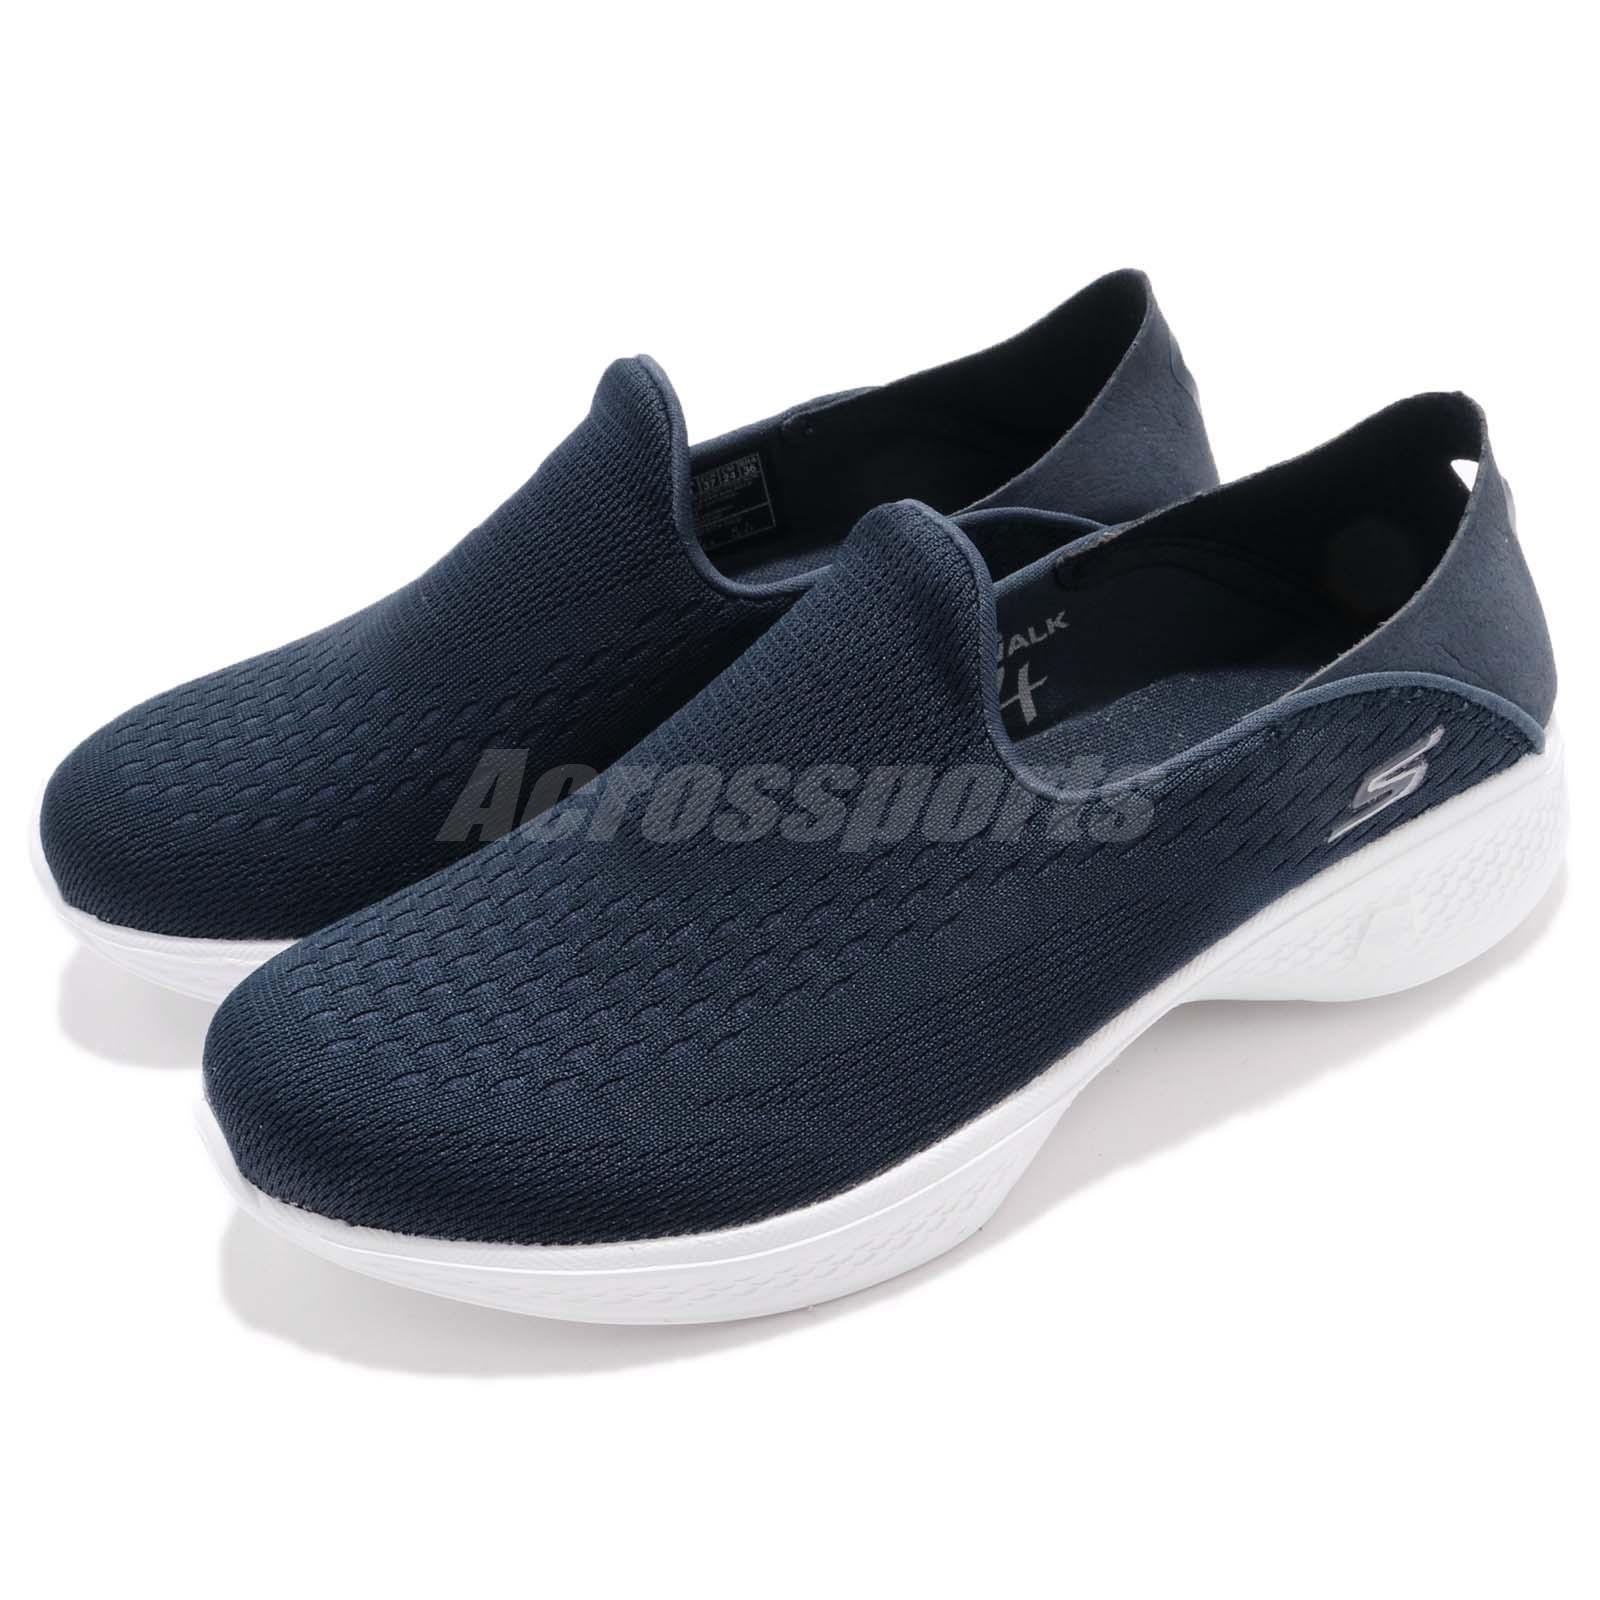 Skechers Go Walk 4 Convertible Navy White Women Slip On Walking Shoes 14929-NVW